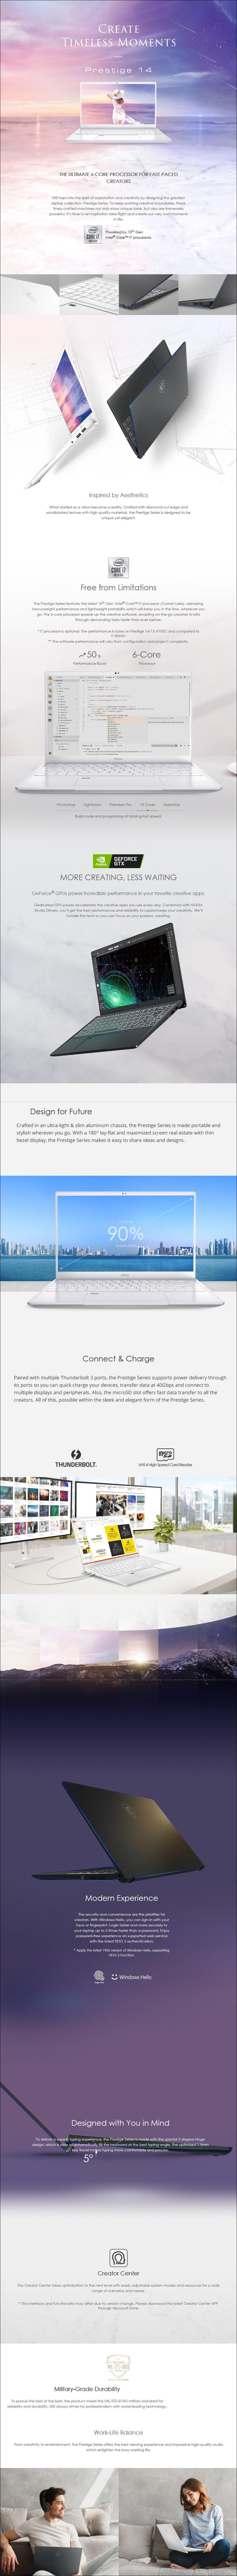 msi-prestige-14-a10sc-14-4k-laptop-i710710u-16gb-1tb-gtx1650-w10p-grey-ac28920-4-1-.jpg